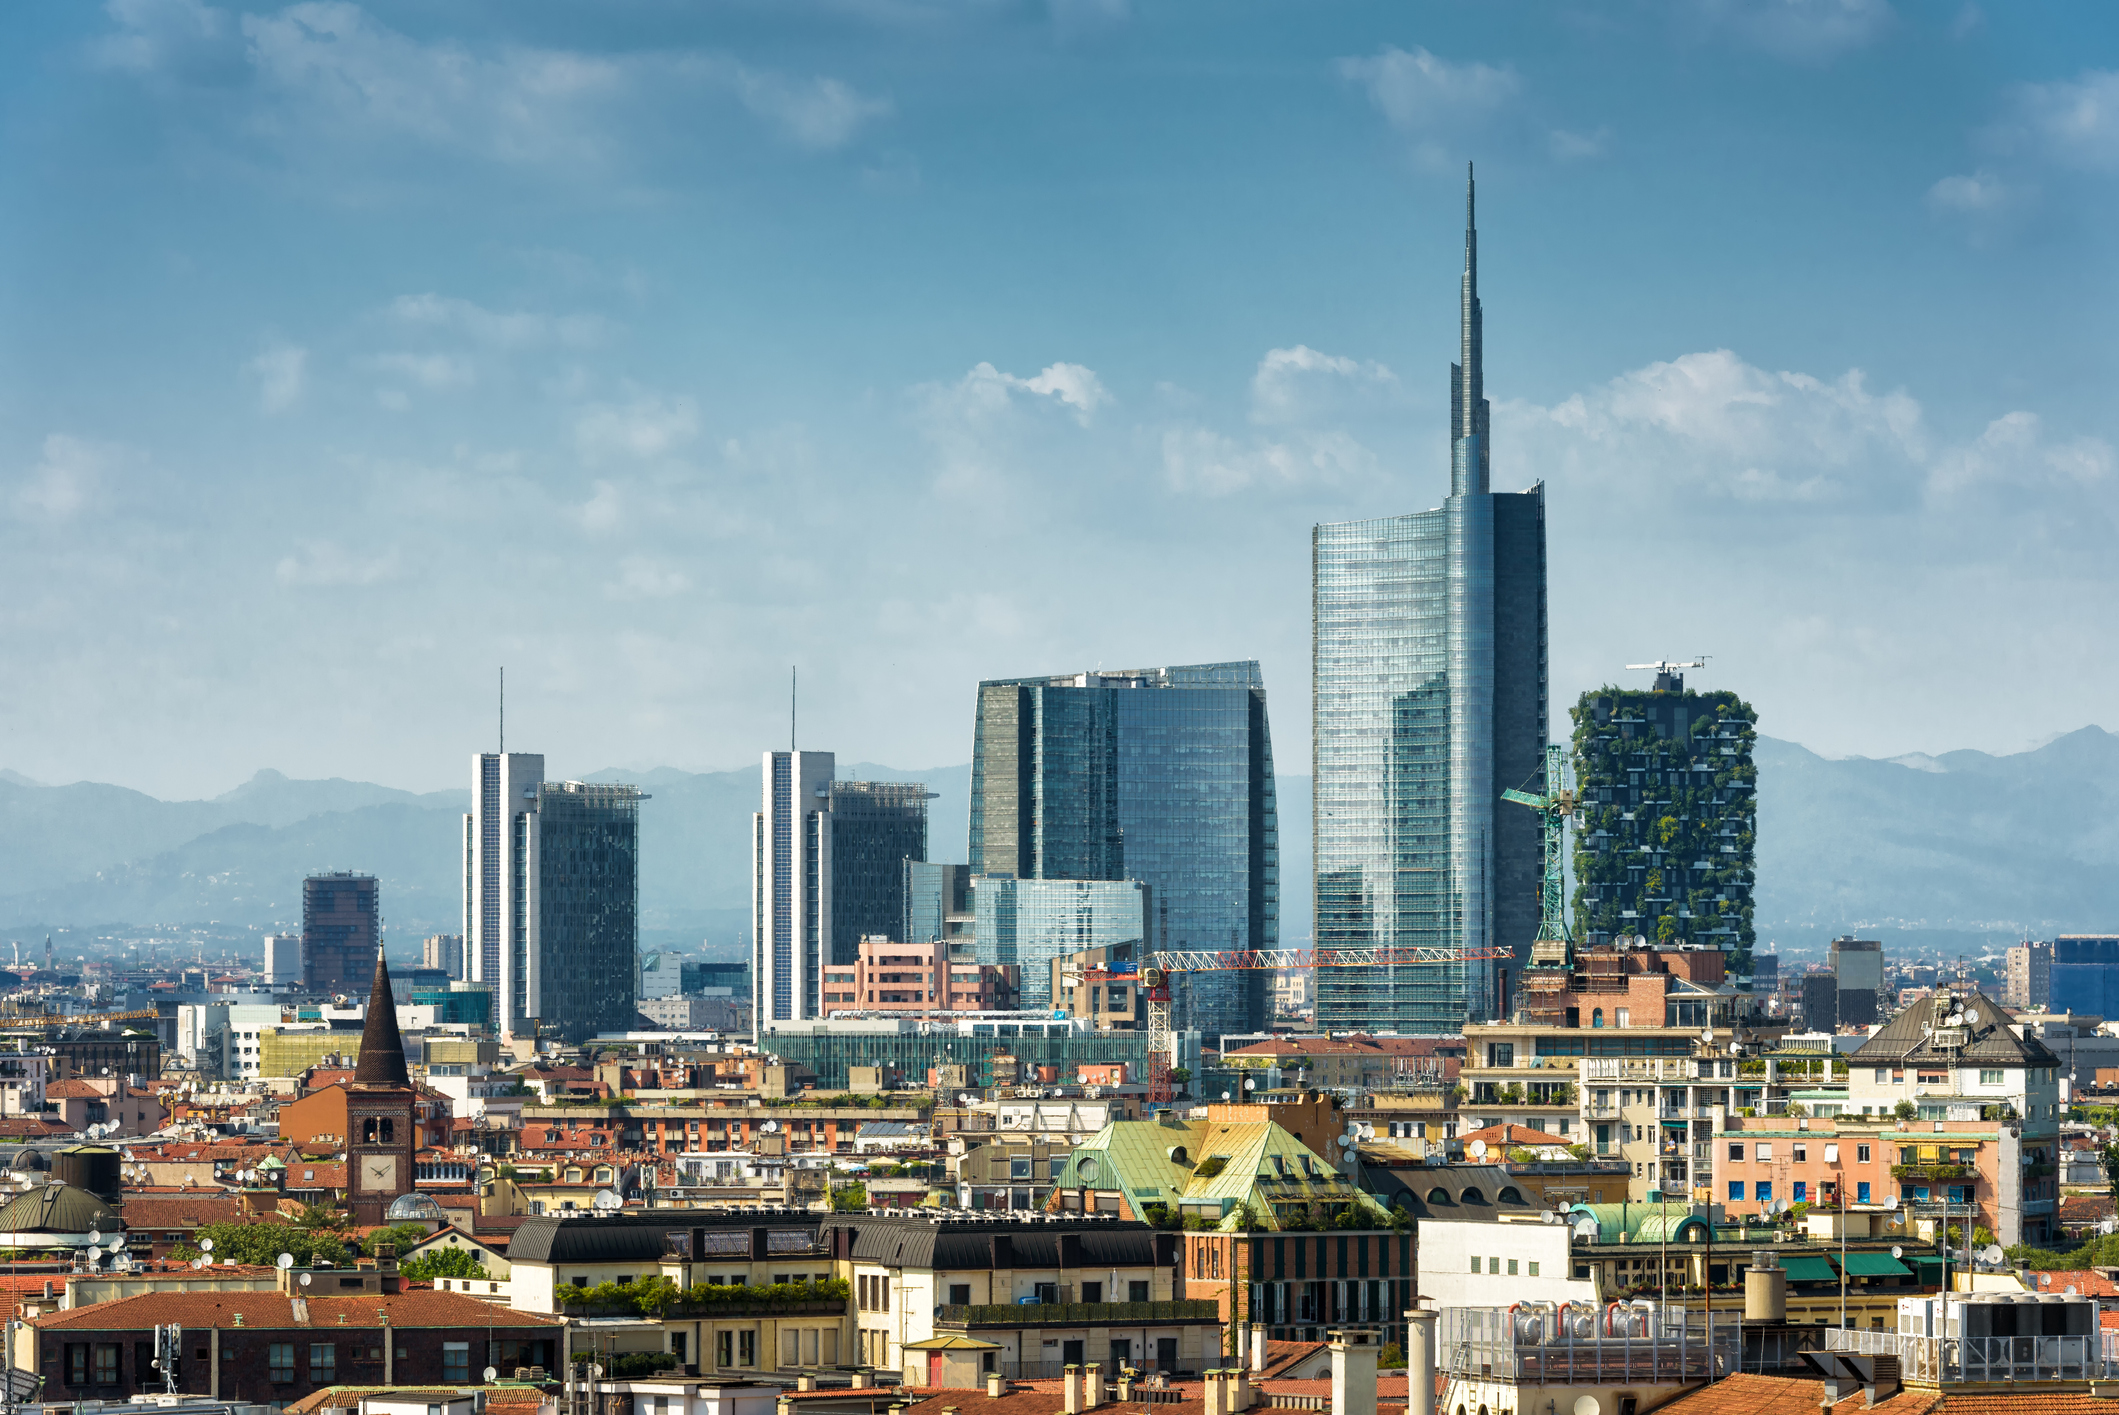 Milan skyline with modern skyscrapers